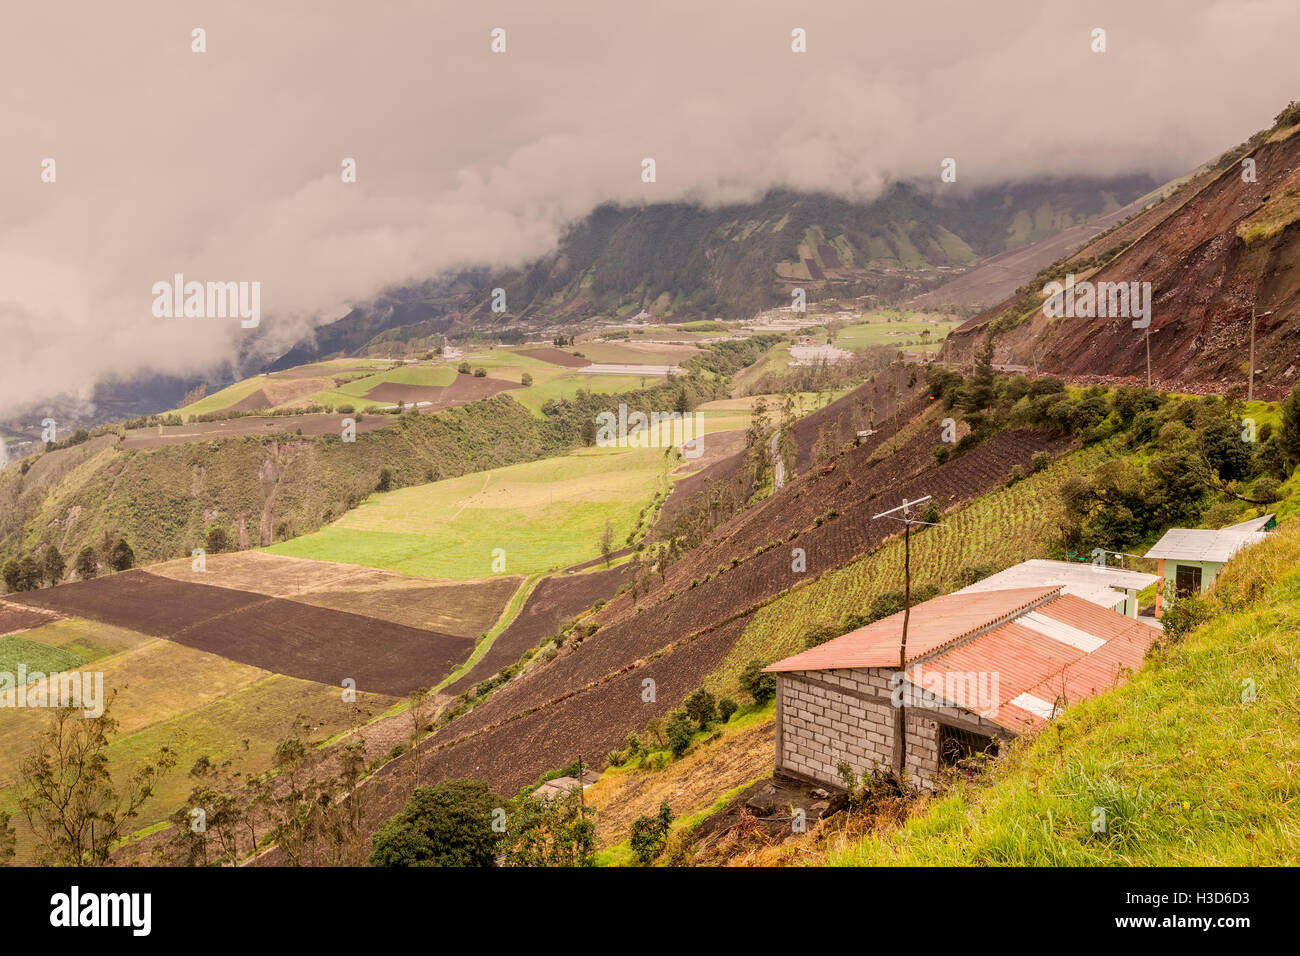 Farmers In The Peaks Of The Andean Cordillera, Ecuador, South America Stock Photo